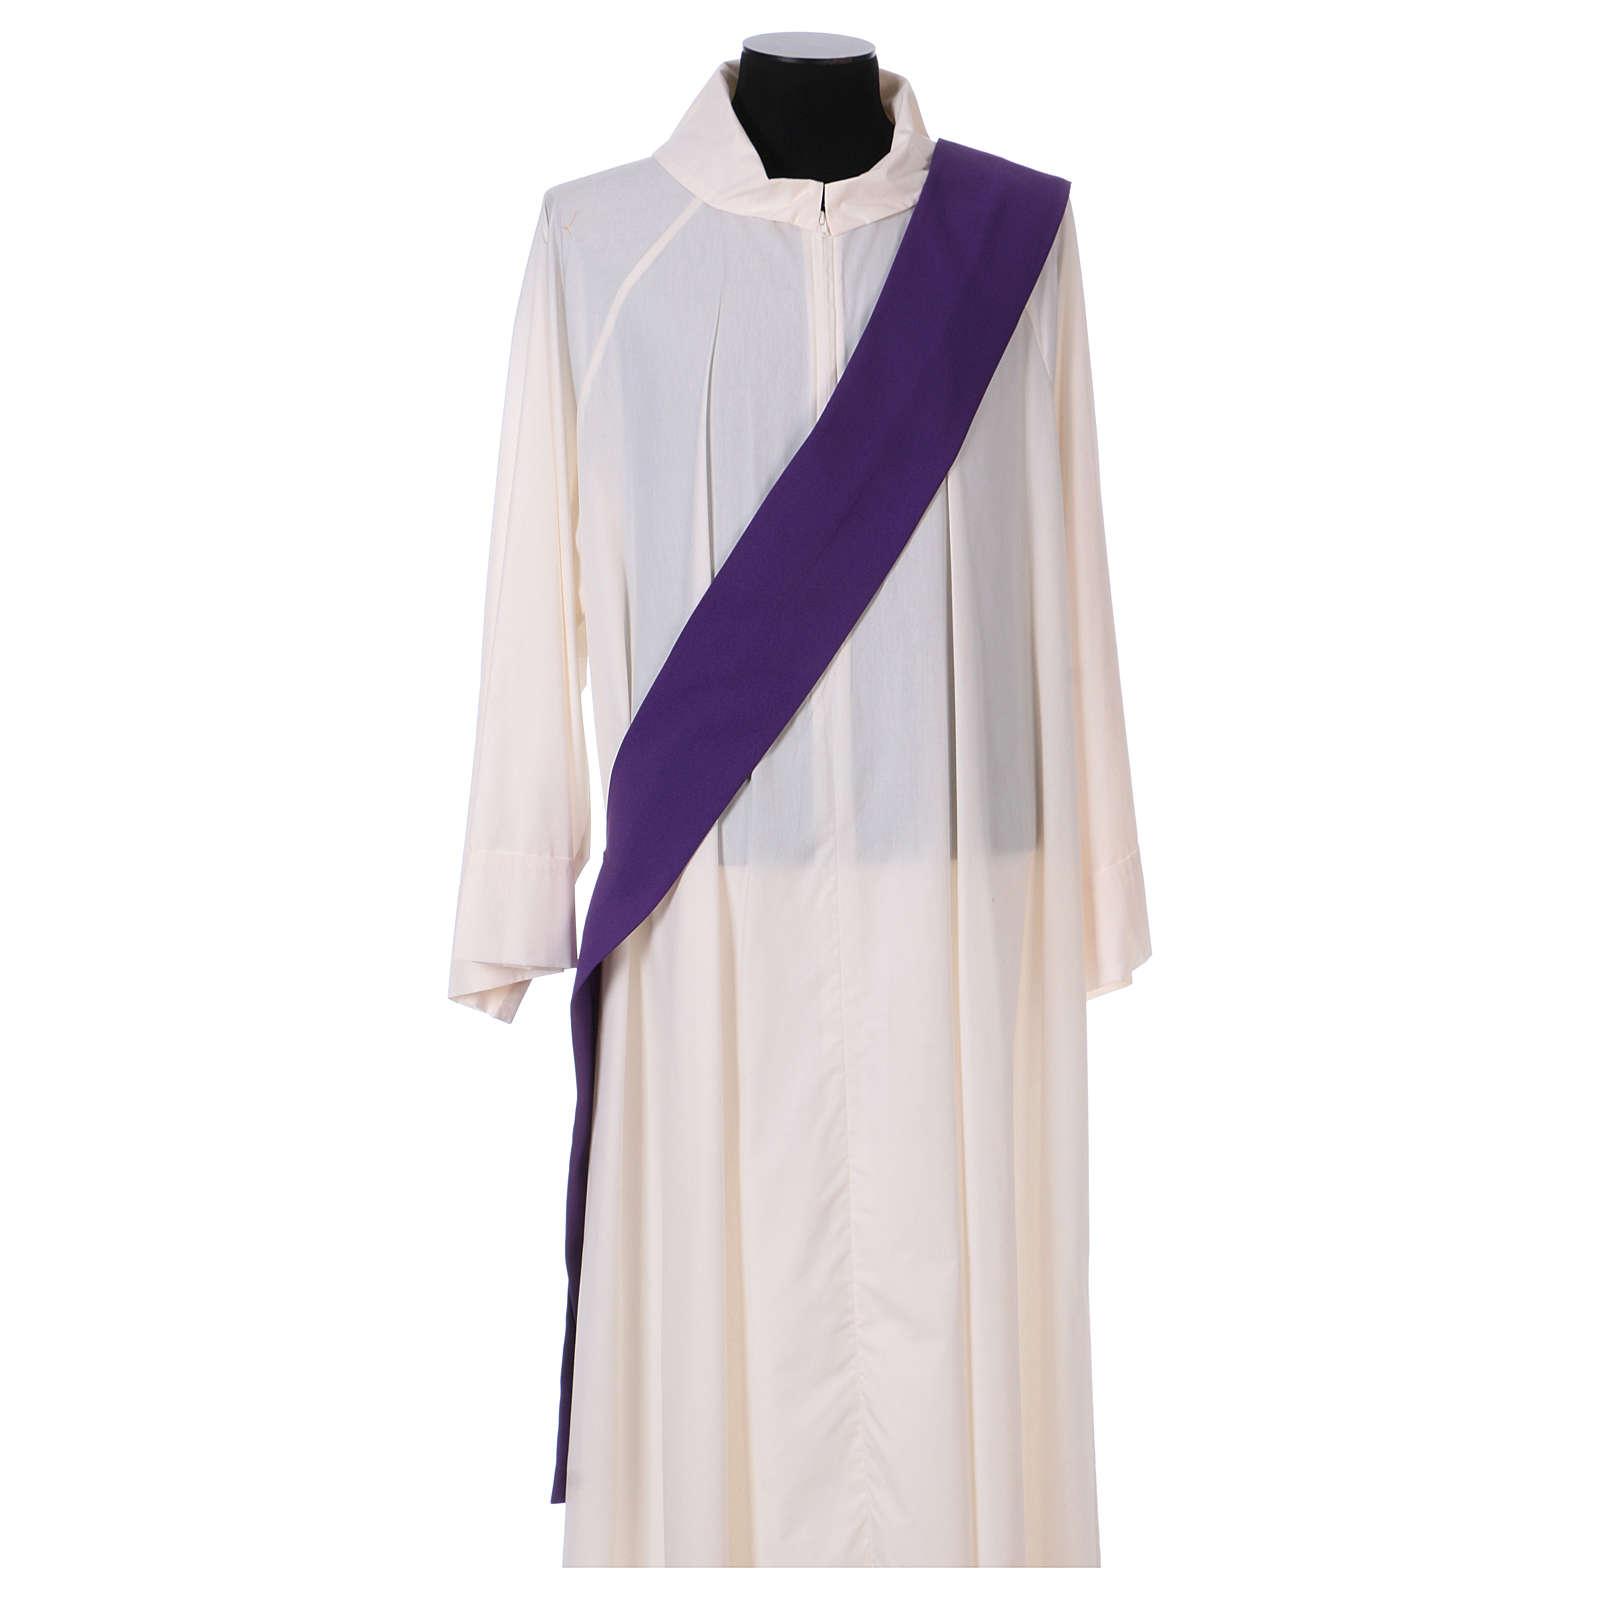 Dalmática entorchado aplicado parte anterior tejido Vatican 100% poliéster 4